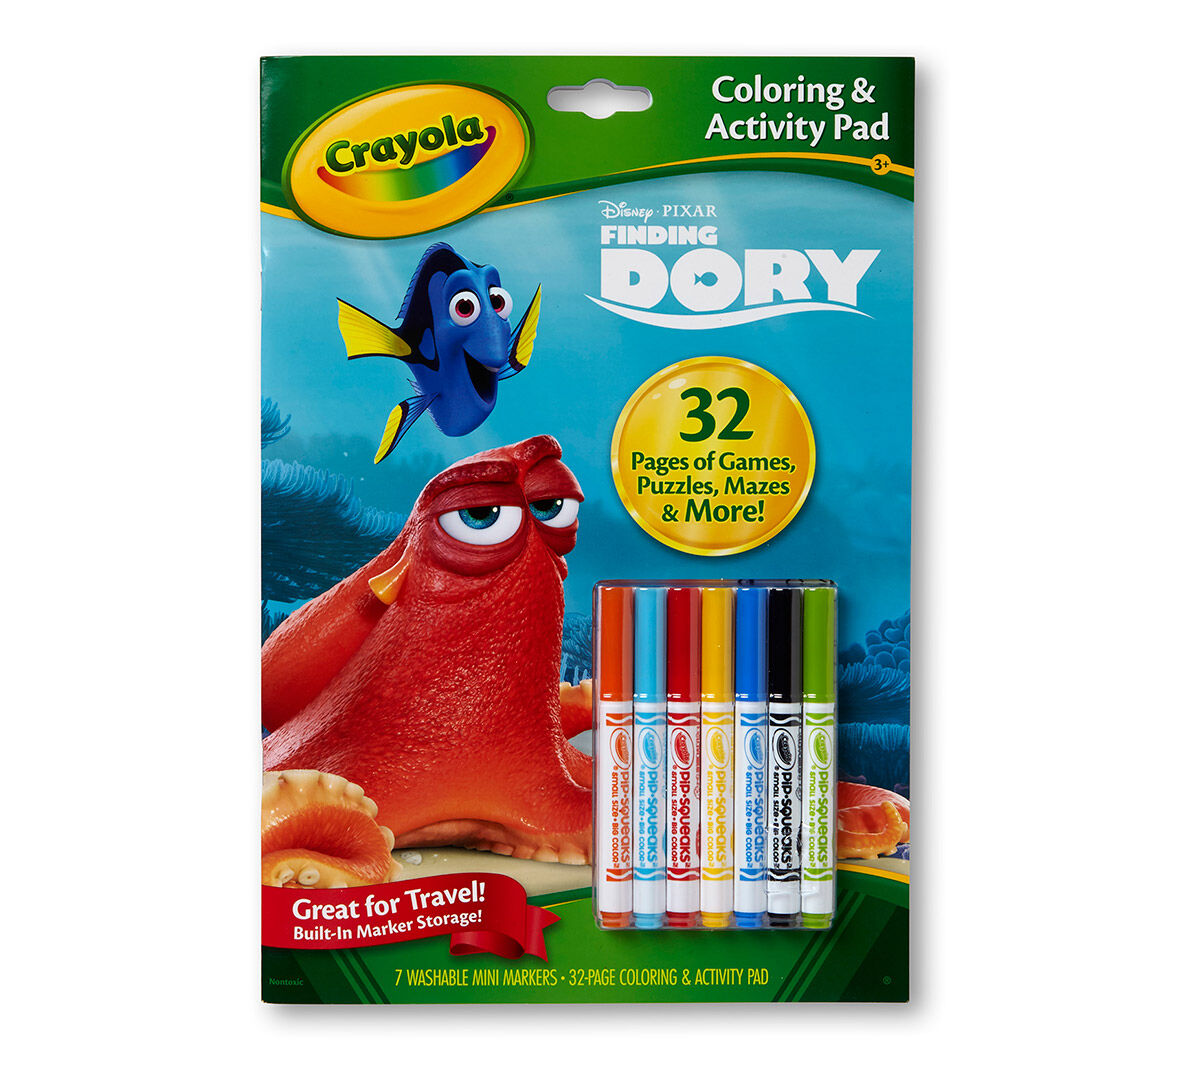 Crayola Paper & Pads - Coloring Books | Crayola